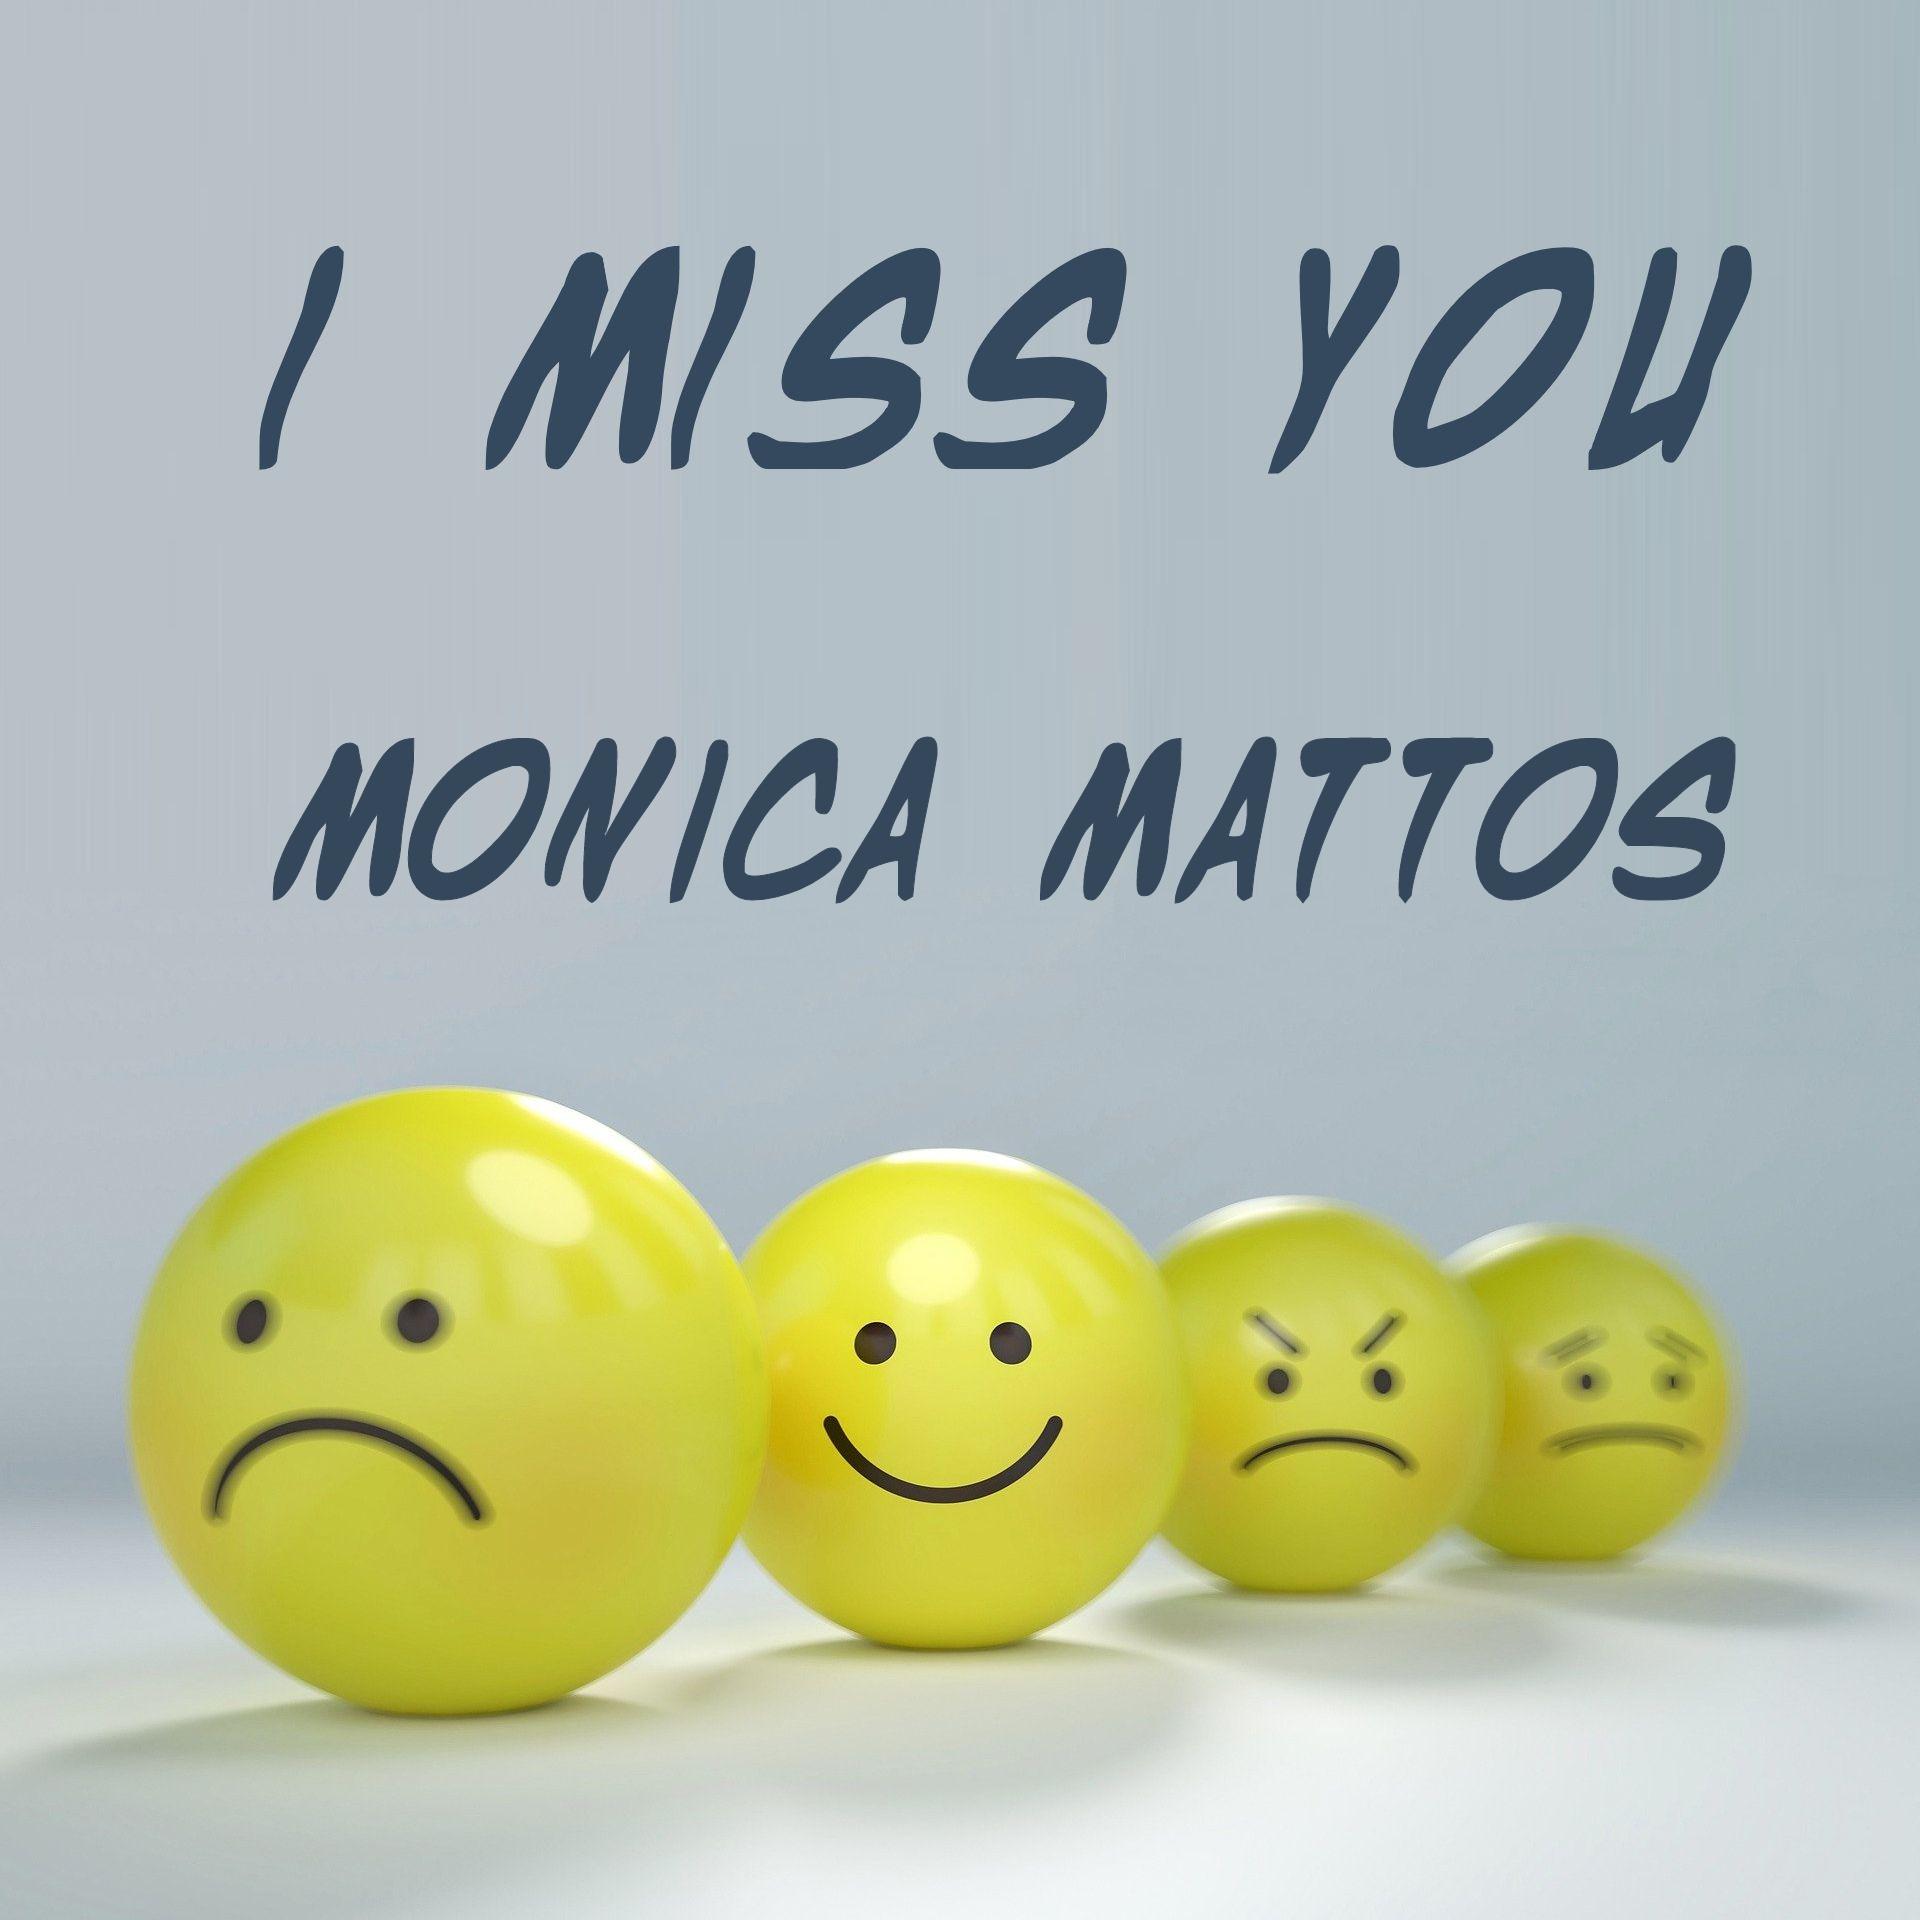 Mattos monica Monica Mattos